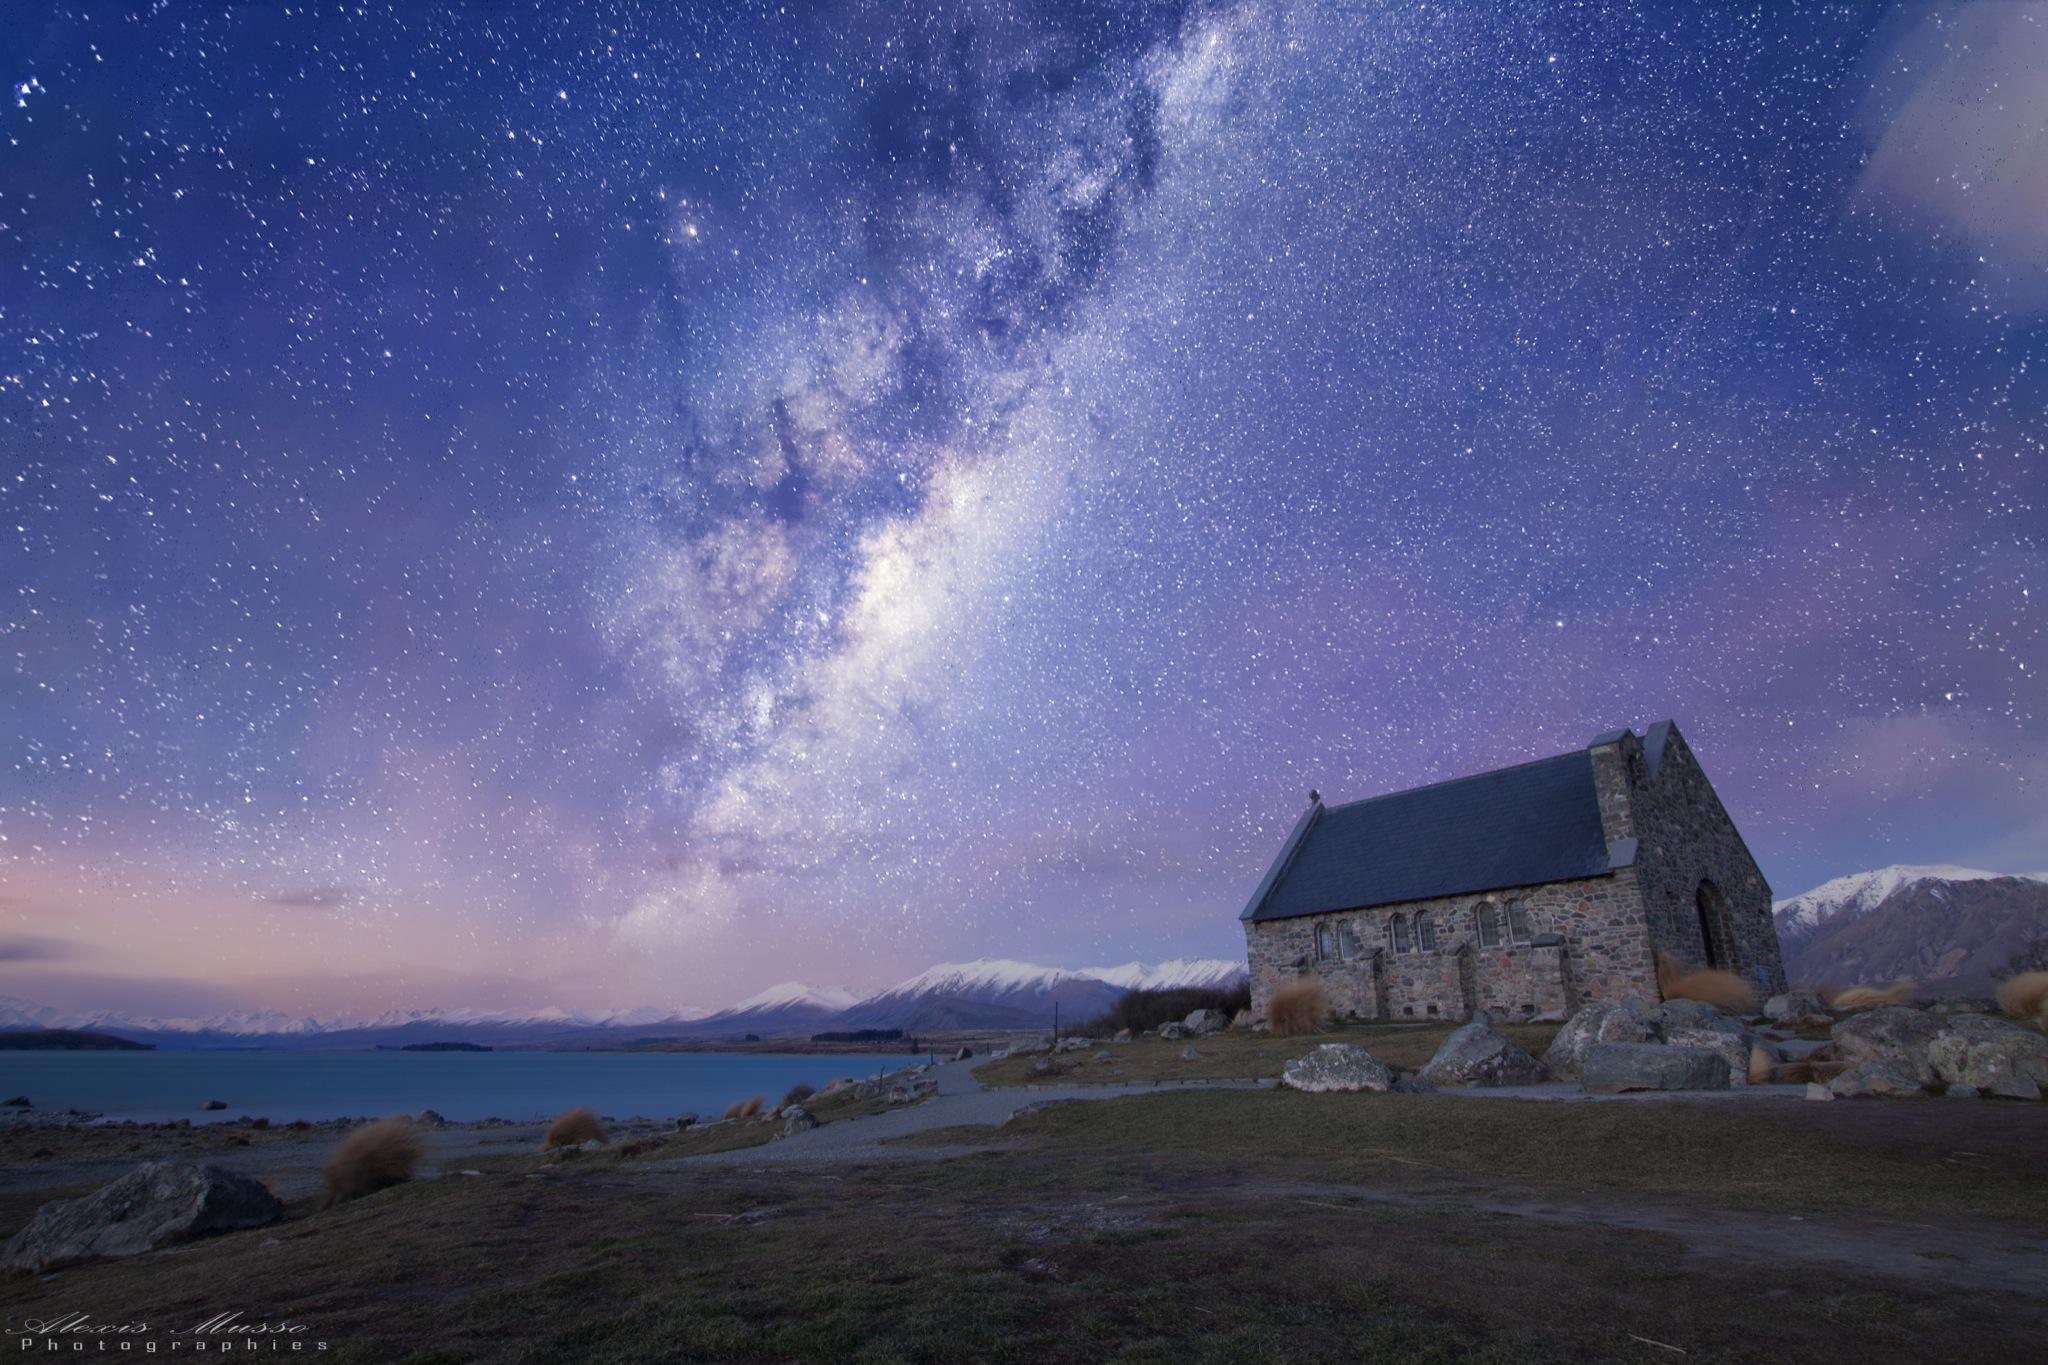 Church of Good Shepherd - Lake Tekapo, New Zealand